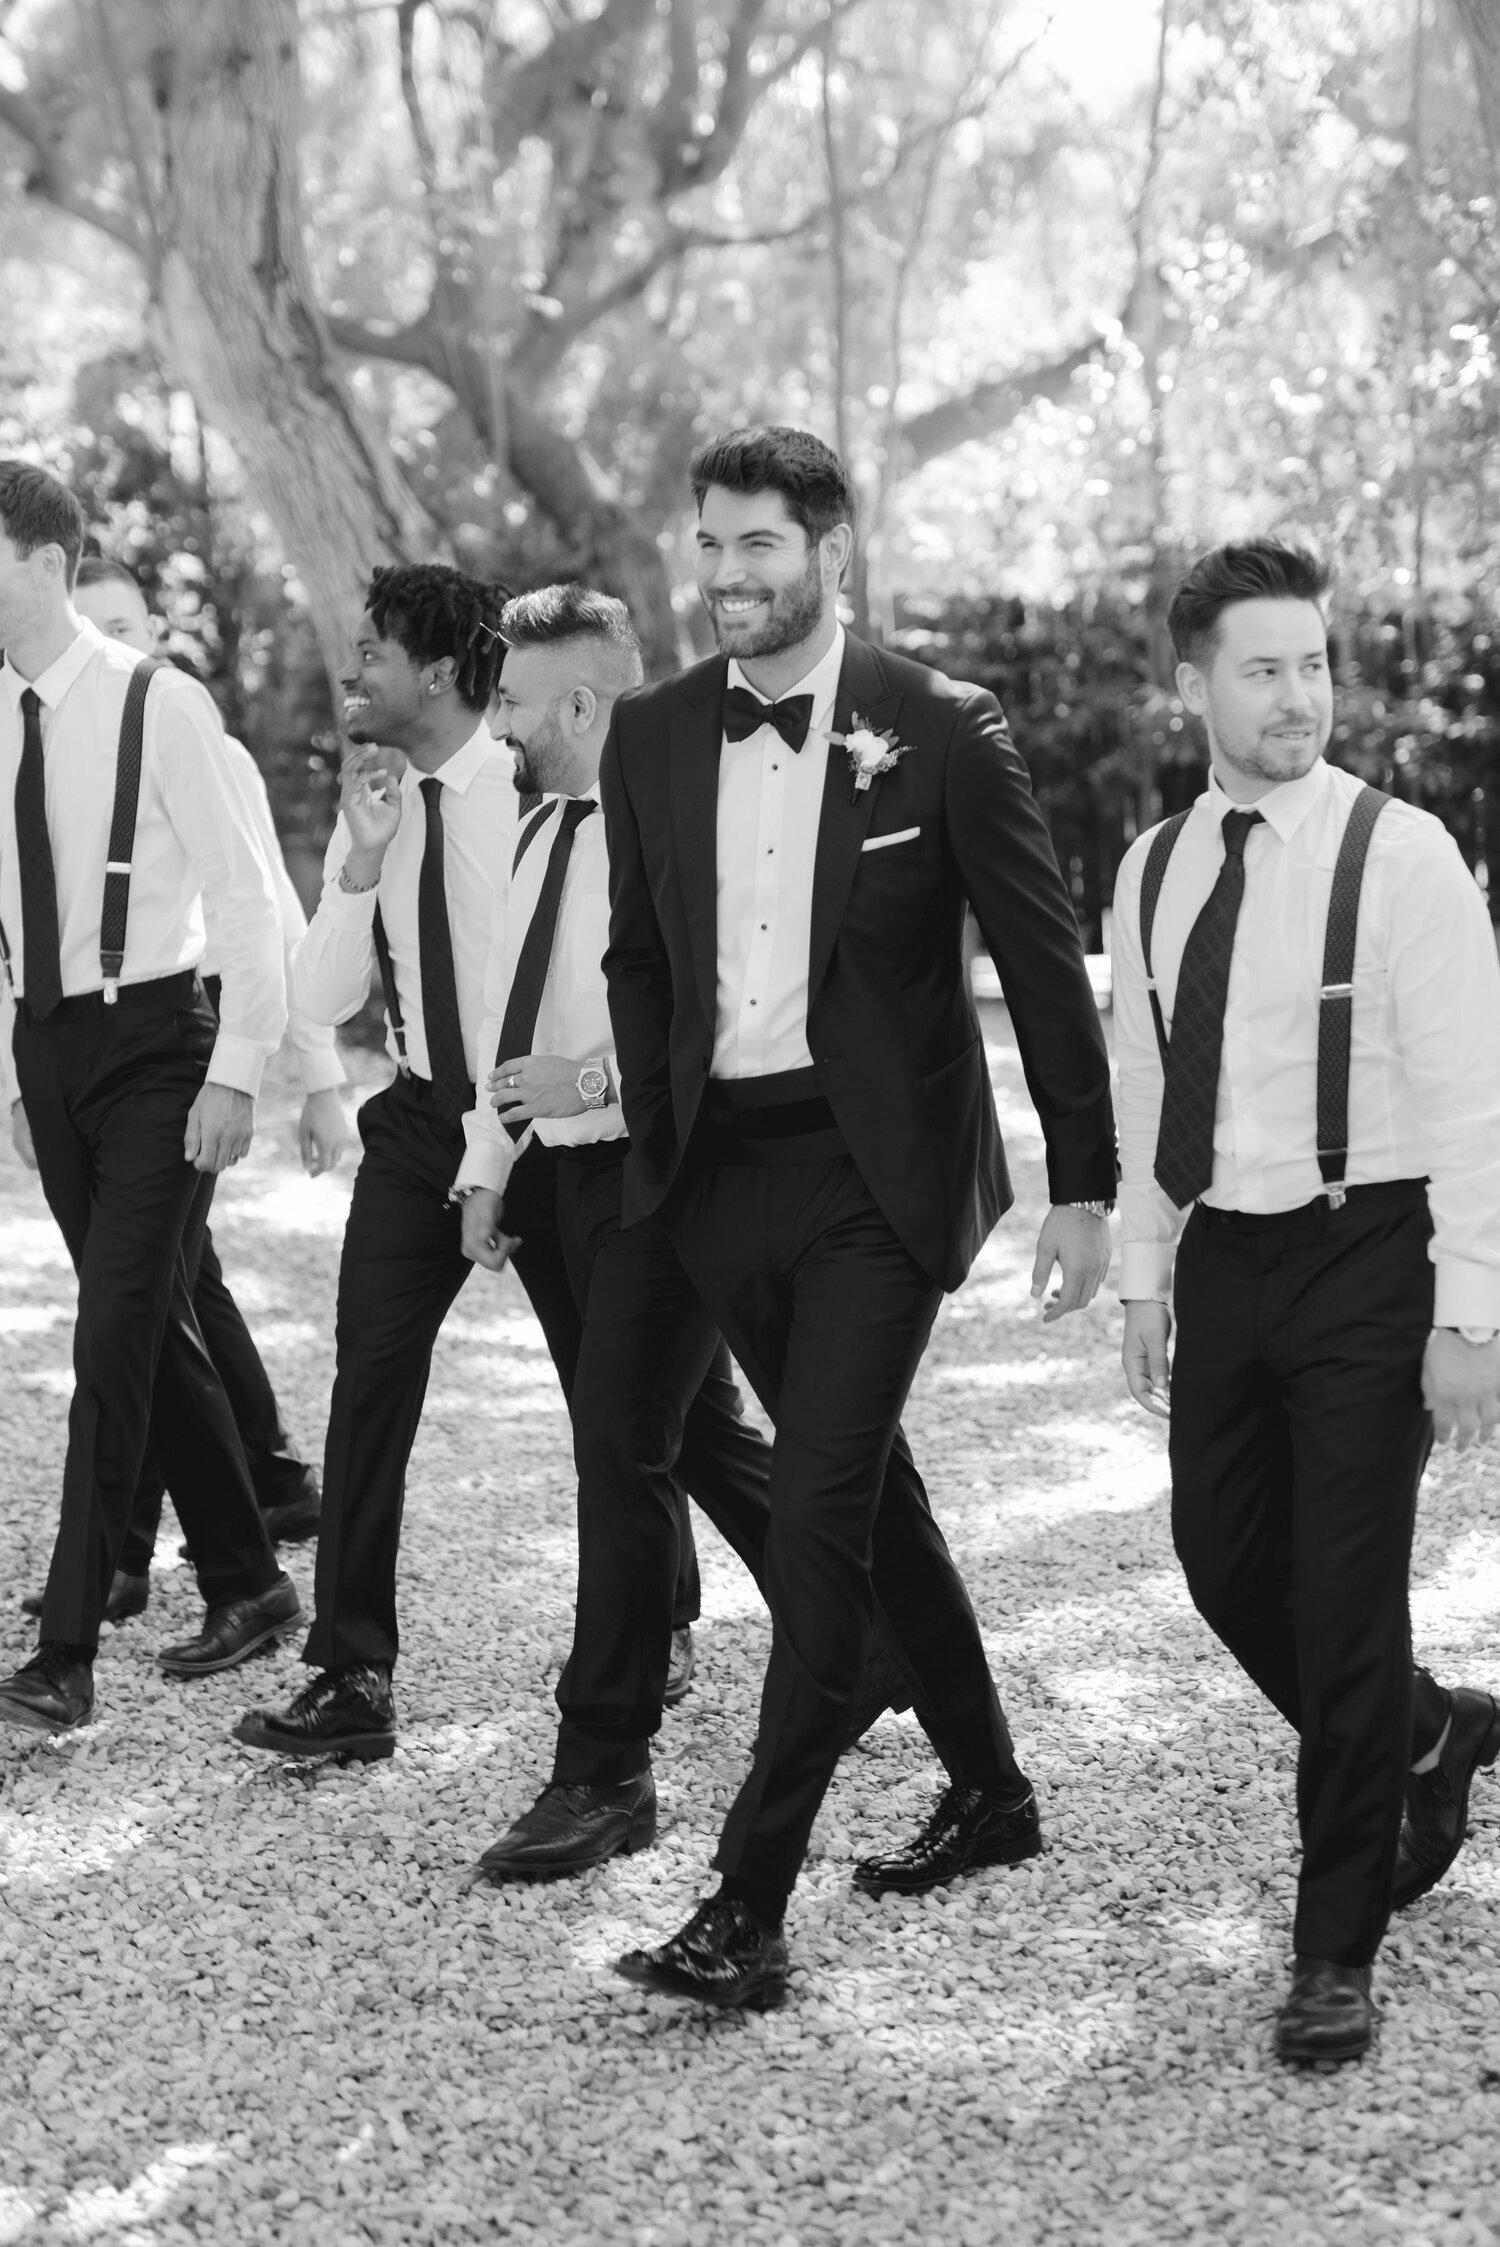 NICK BATEMAN WEDDING DALLA